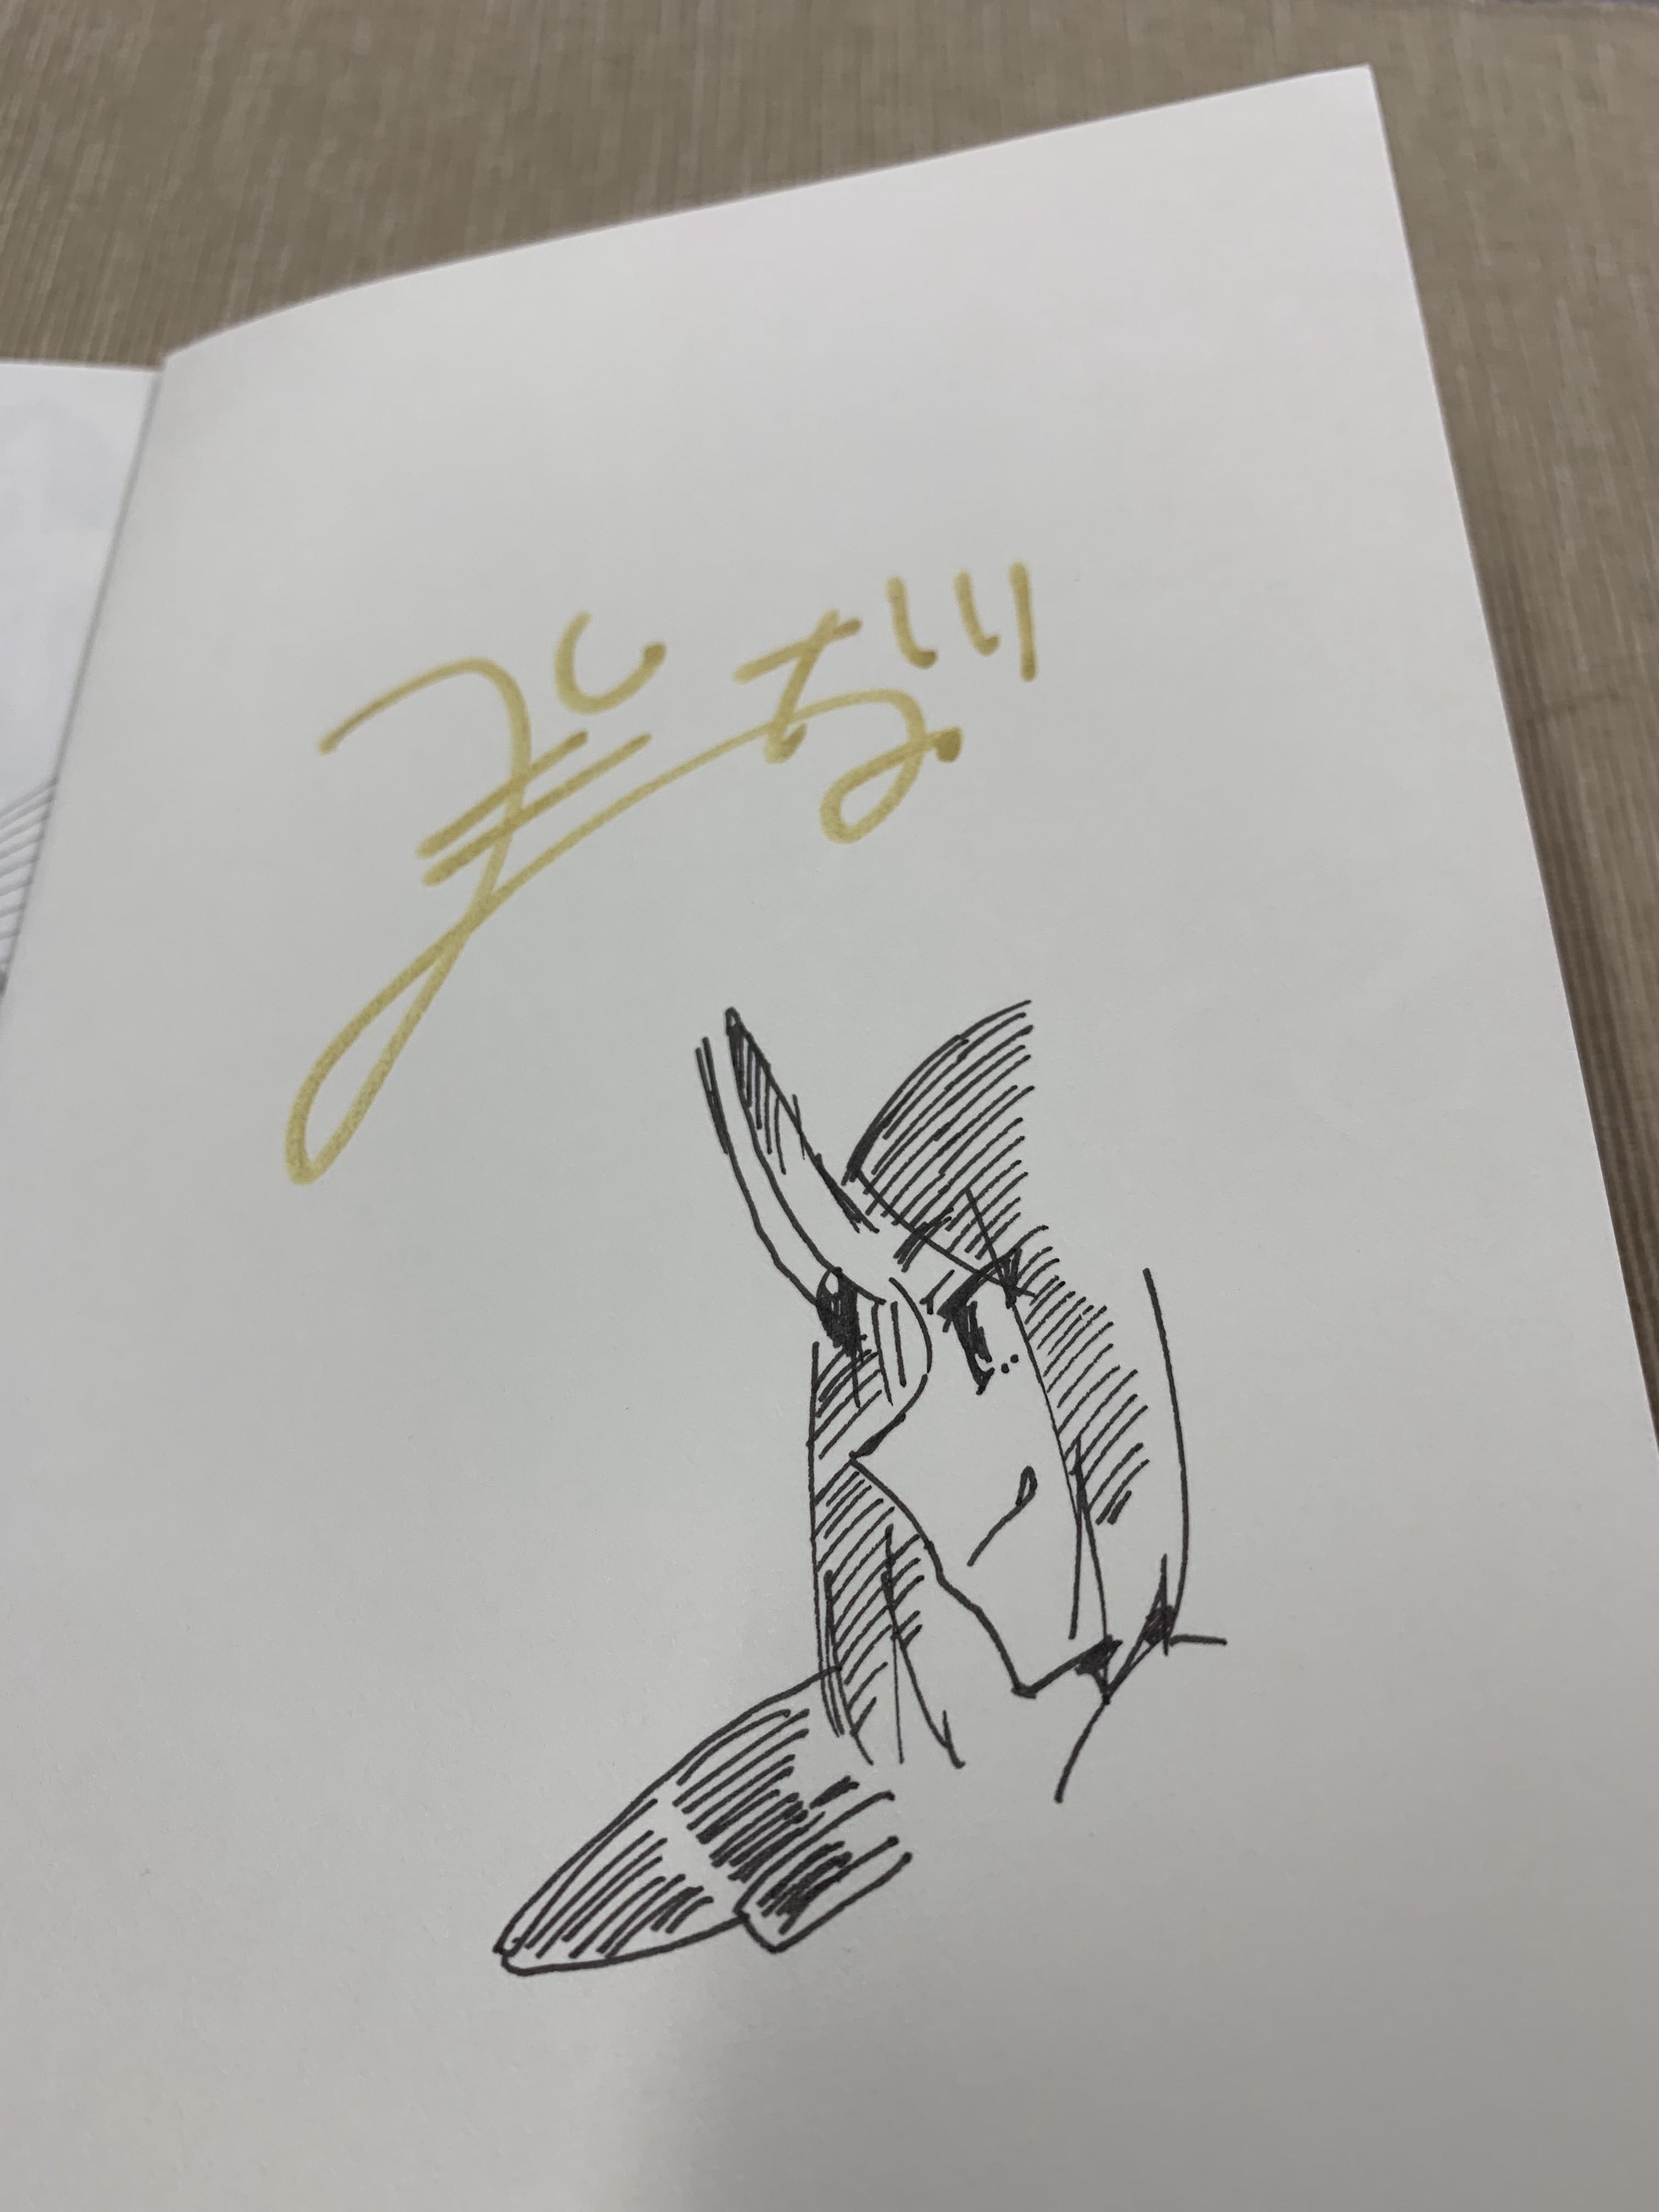 https://sai-zen-sen.jp/editors/STAR8_IMG_0985.jpg